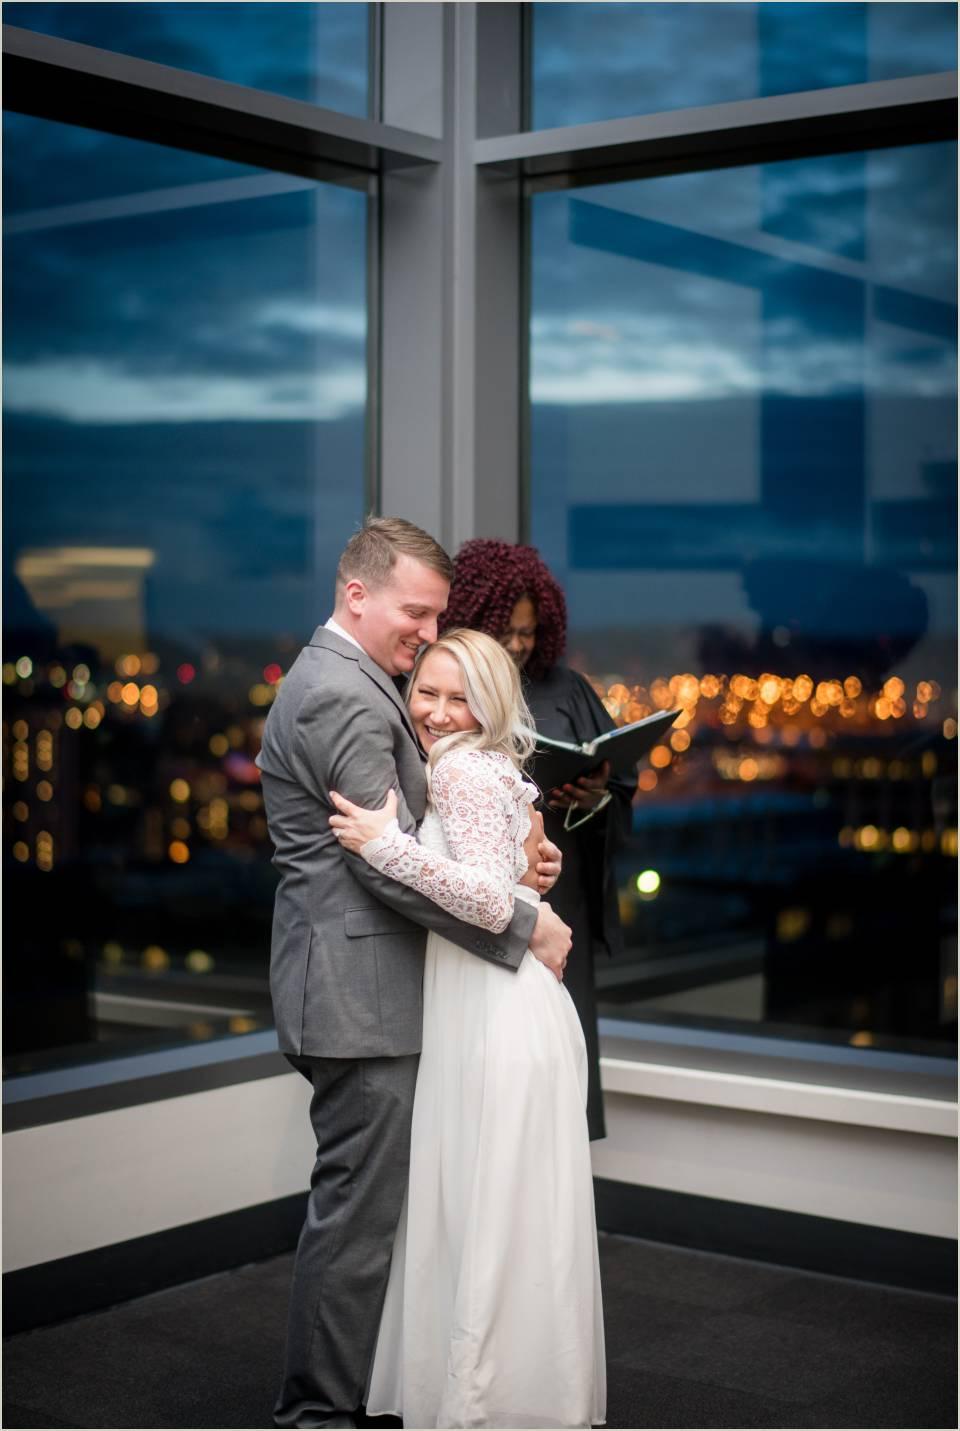 husband and wife couple embracing wedding ceremony